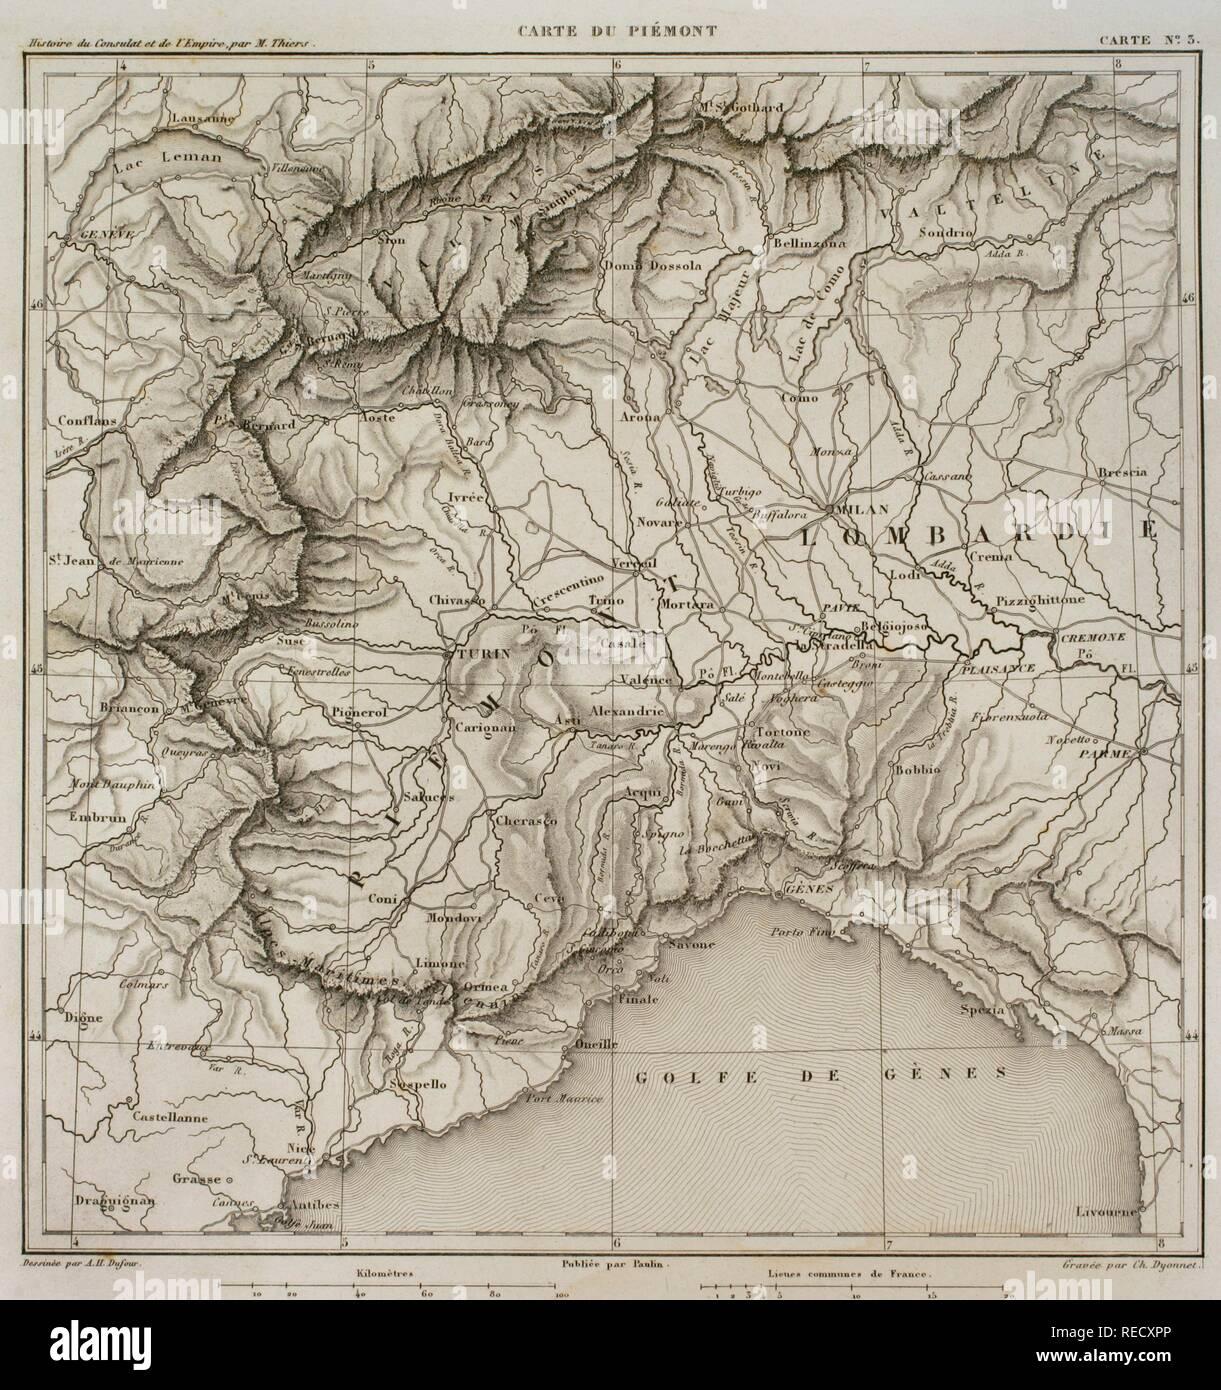 Map Of North West Italy.Map Of Piedmontt Northwest Of Italy Atlas De L Histoire Du